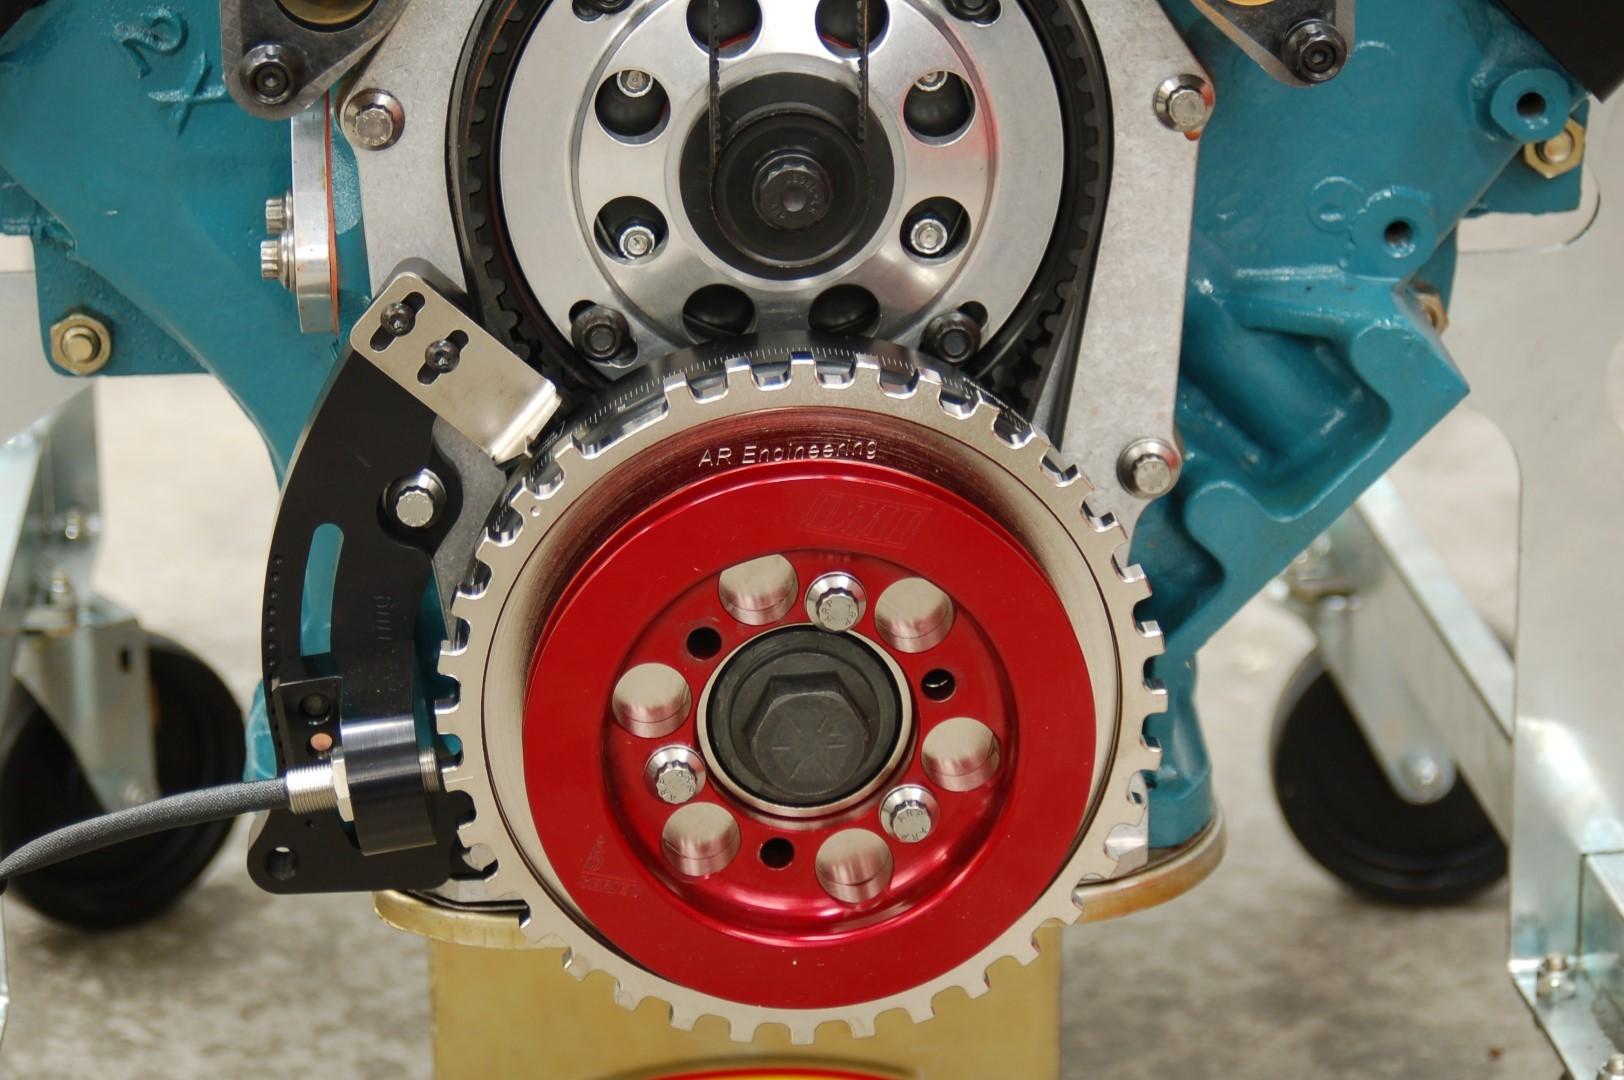 DSC 0709 JPG